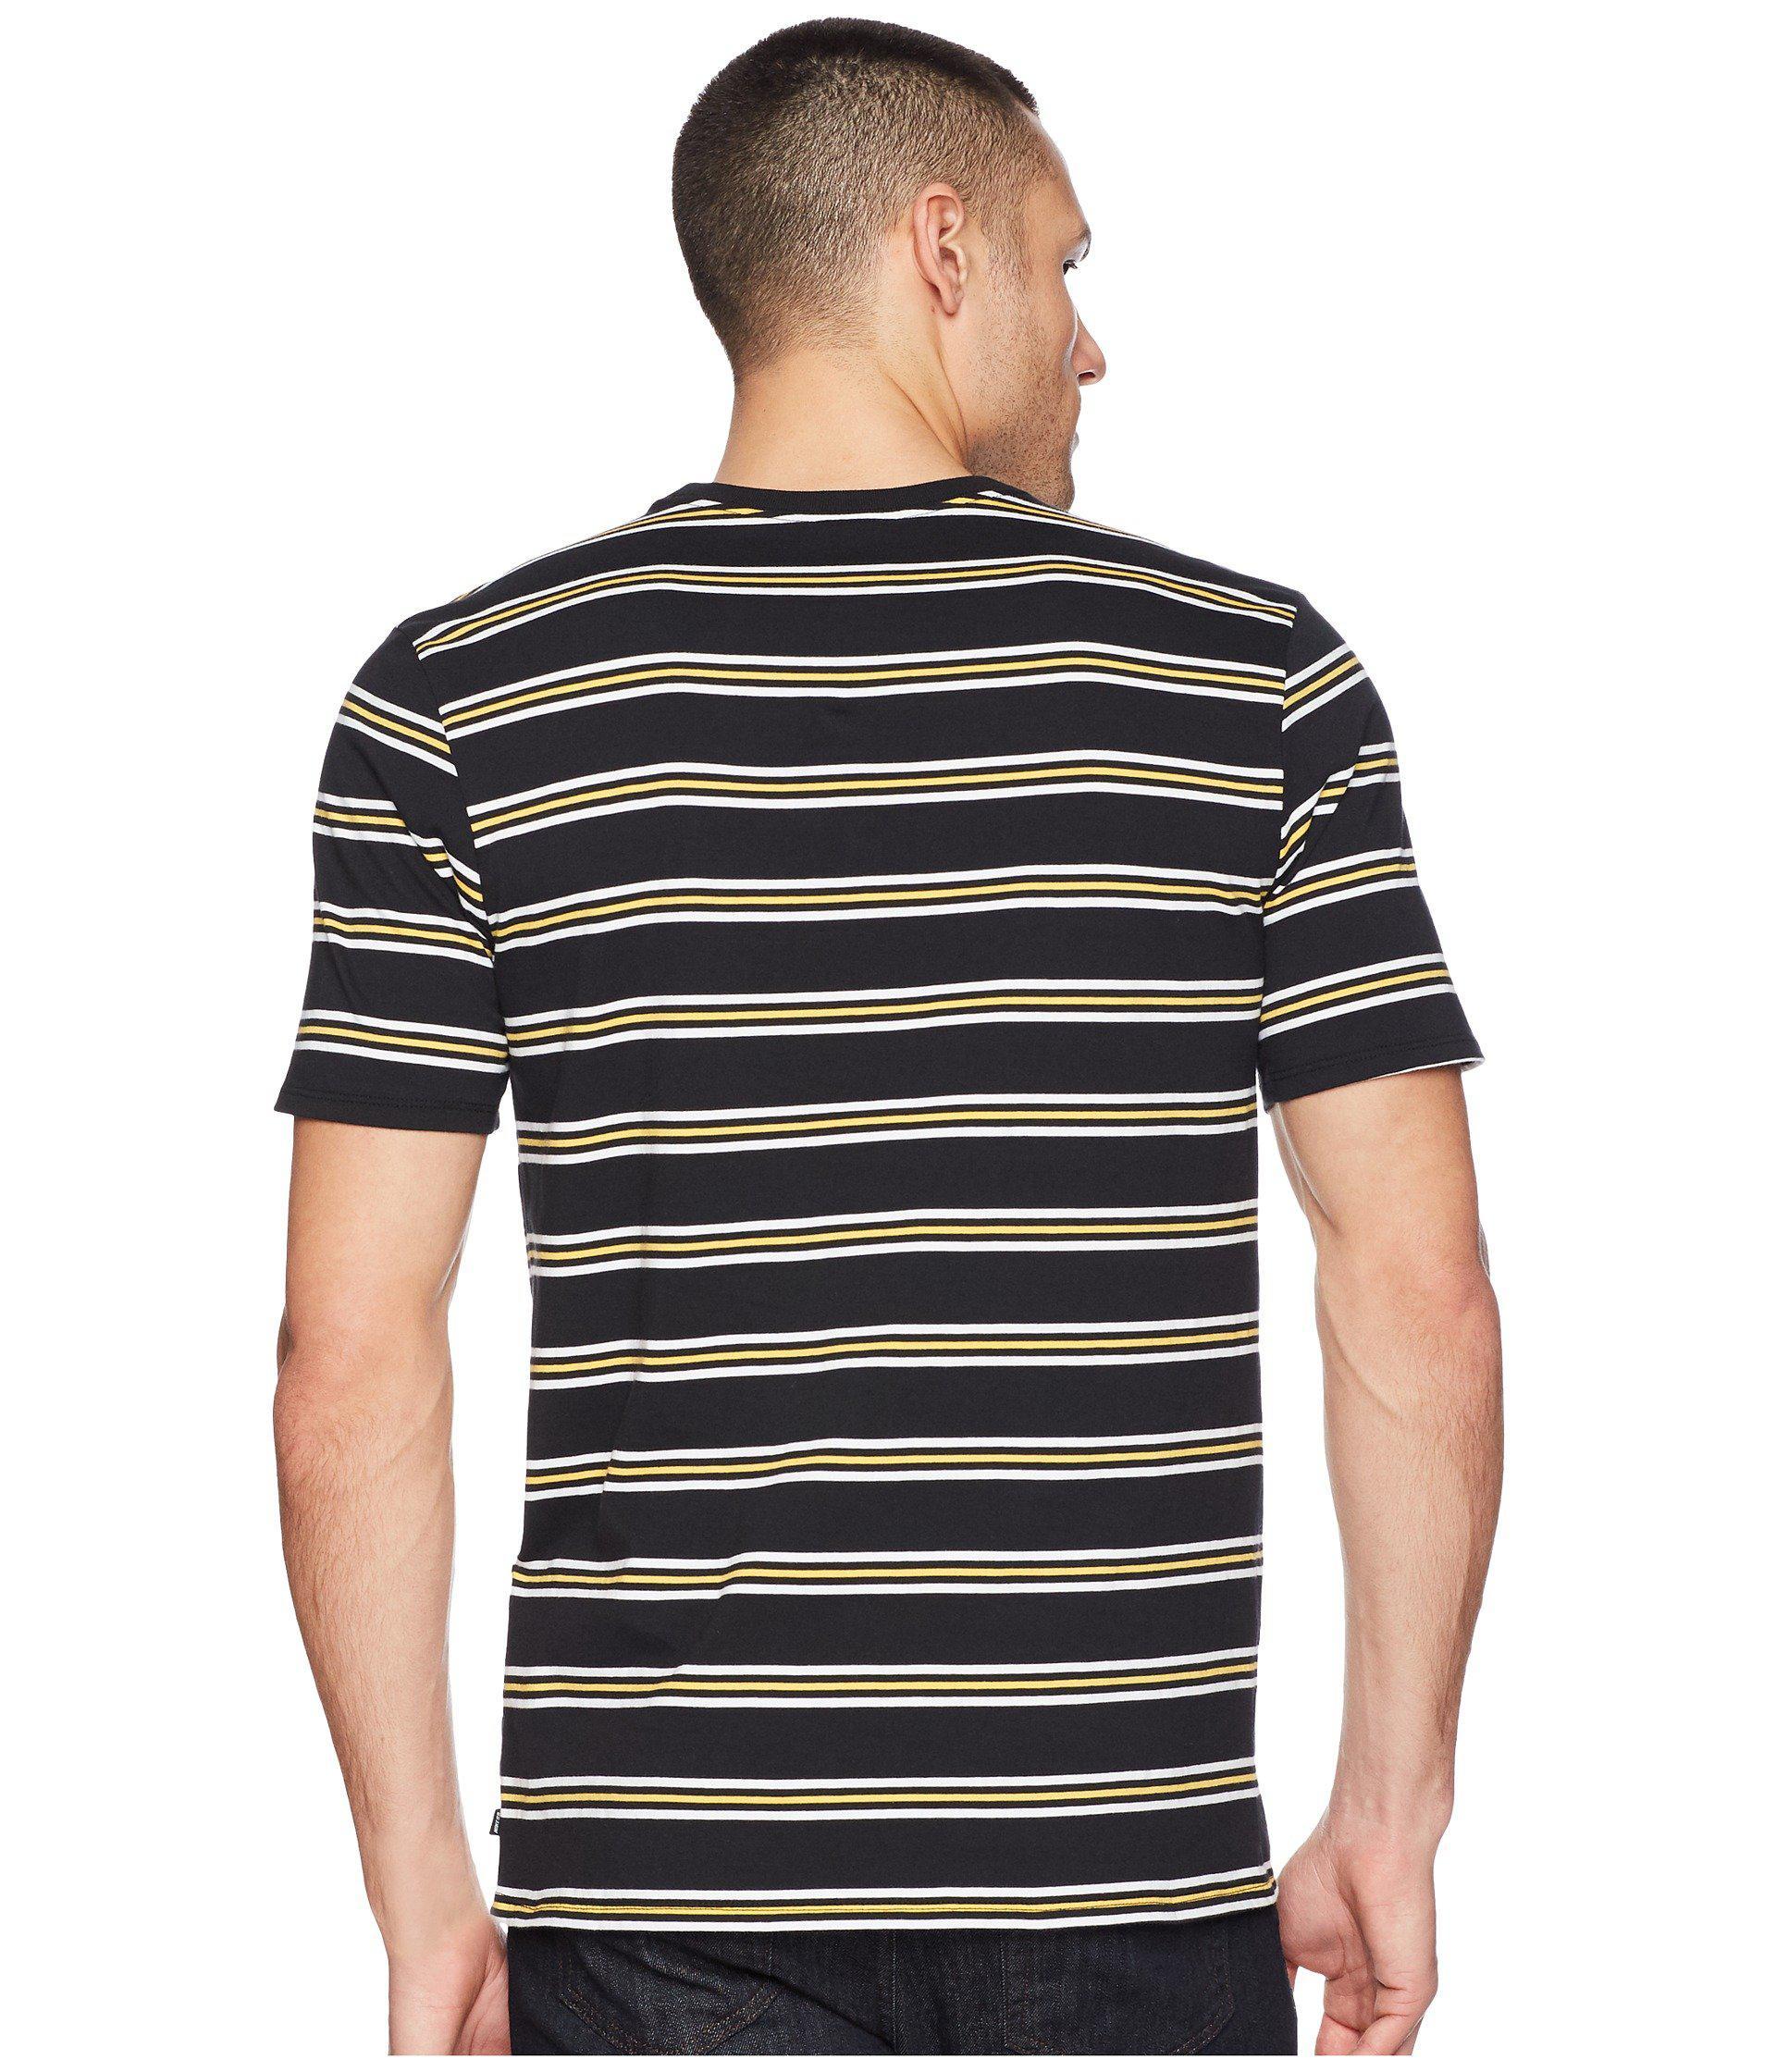 ba9760fc4f9989 Lyst - Nike Sb Tee Summer Stripe (black black hyper Royal) Men s T ...